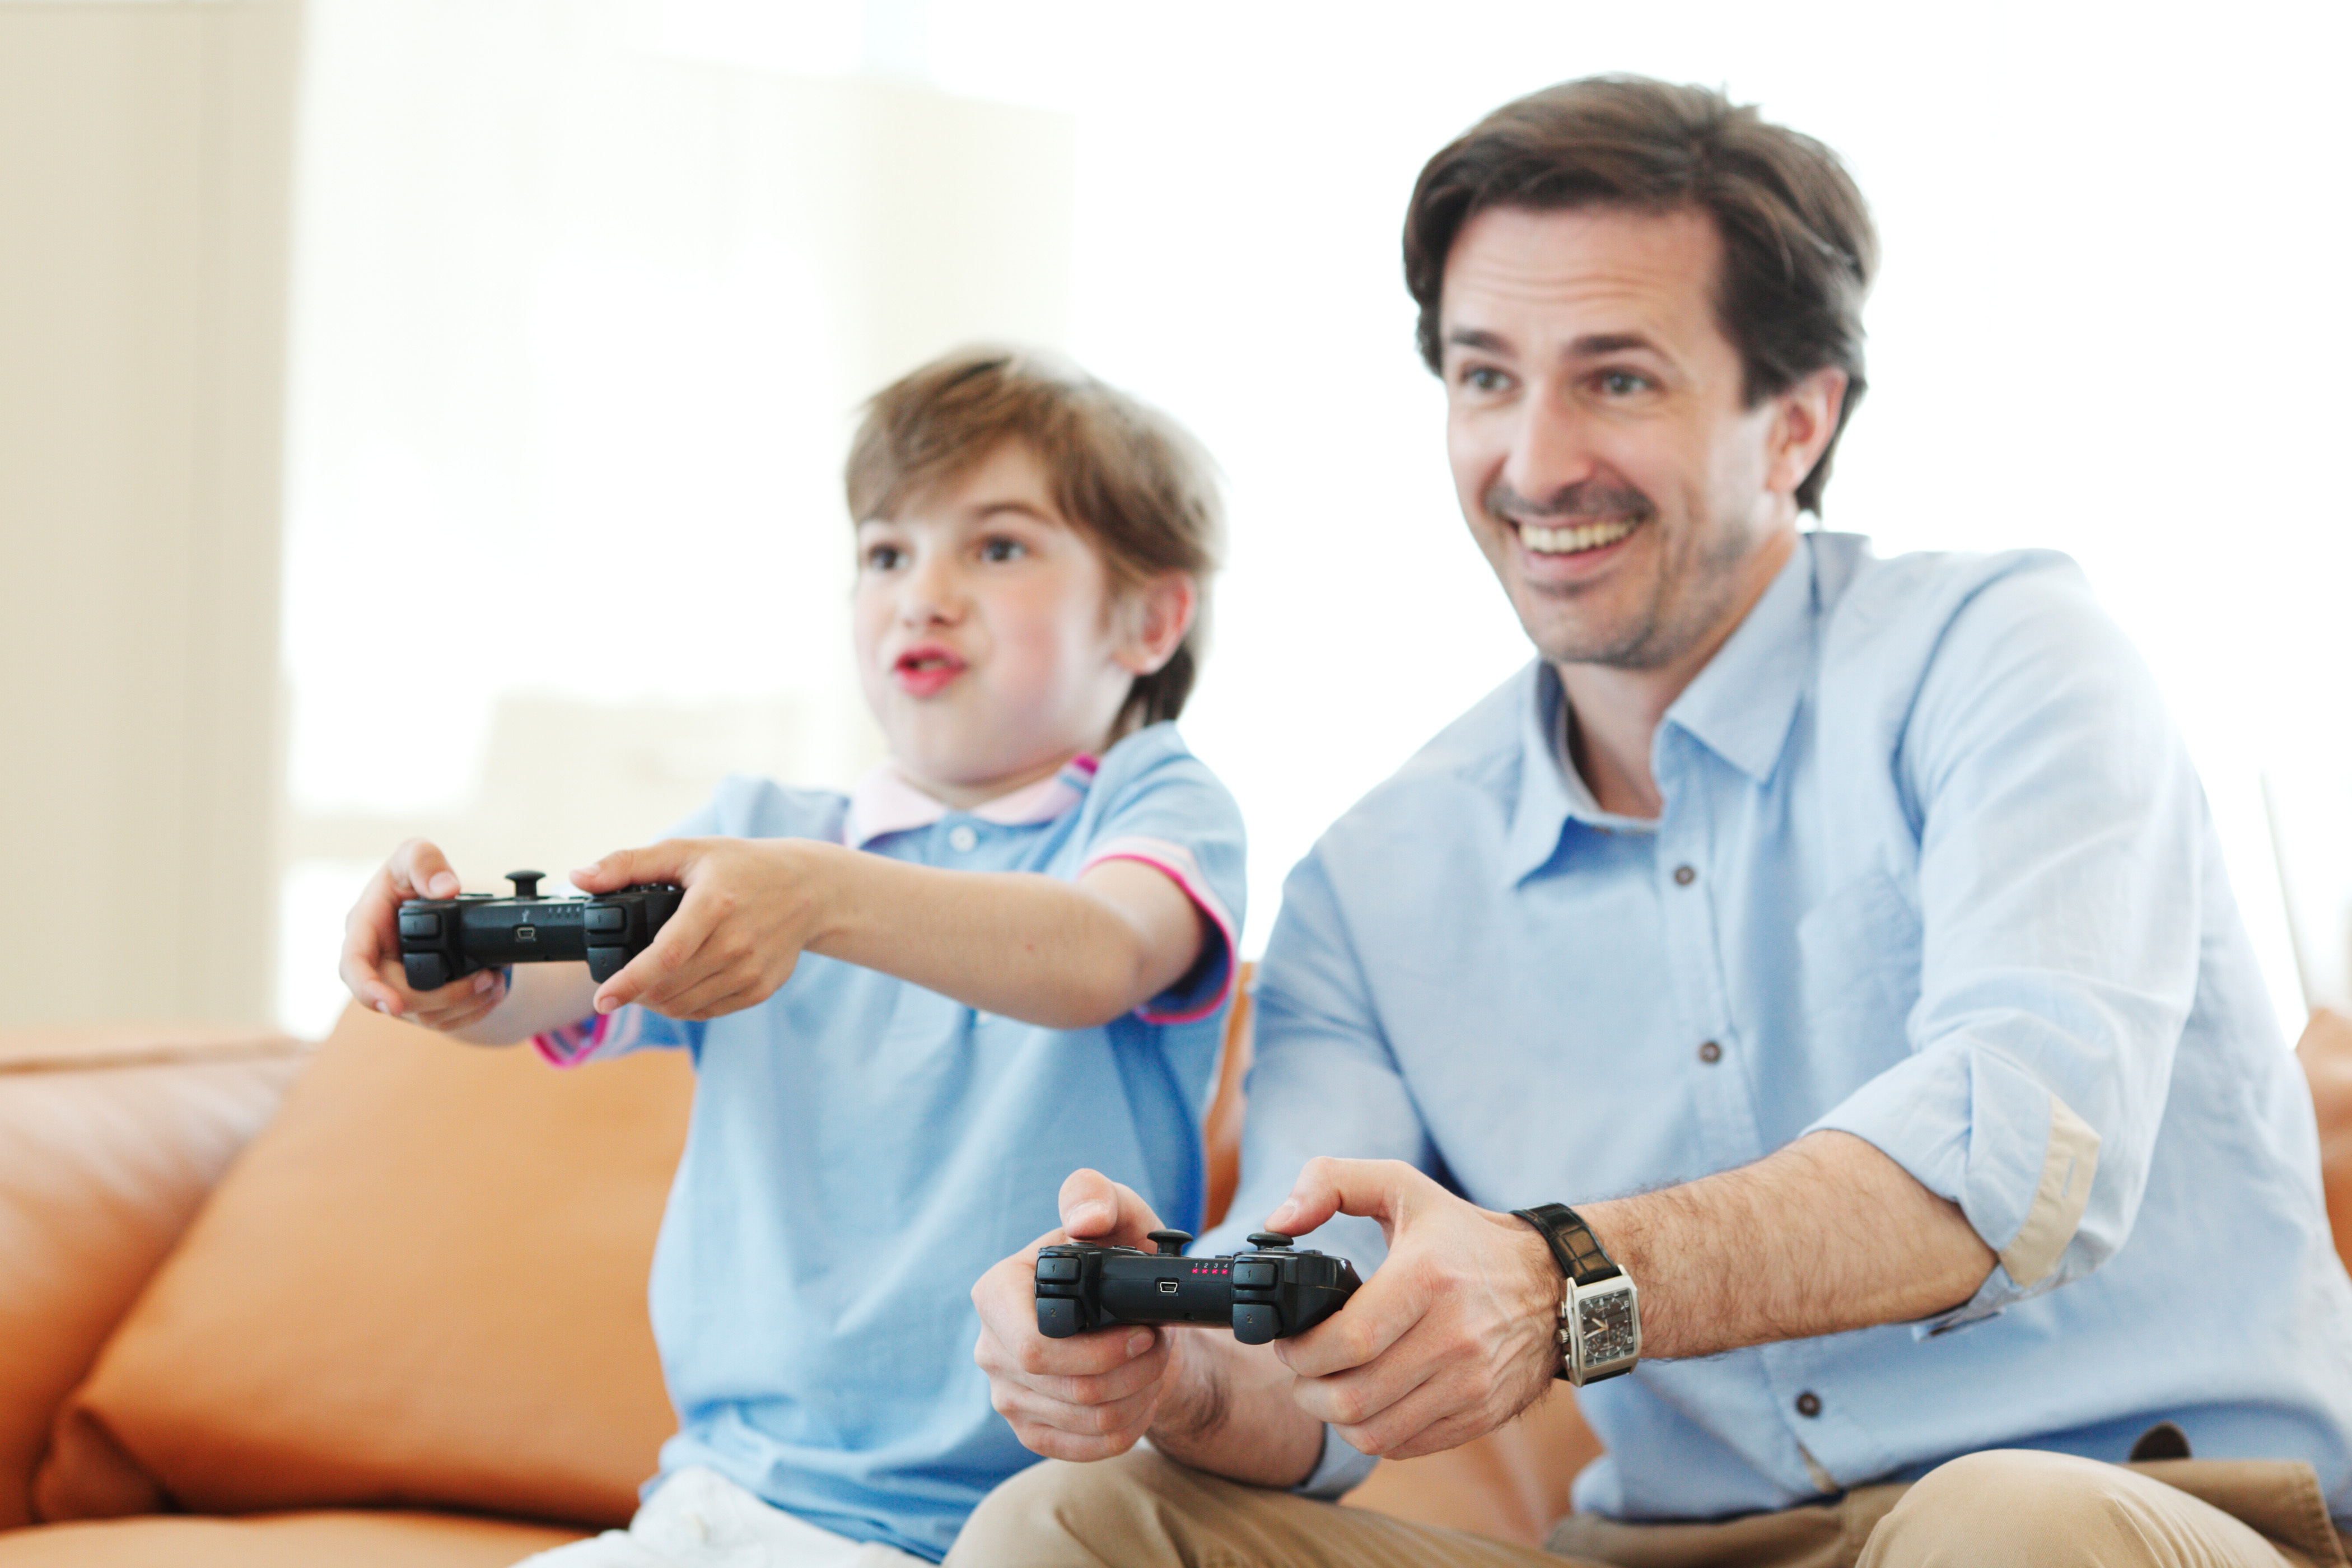 http://www.parentingthemodernfamily.com/